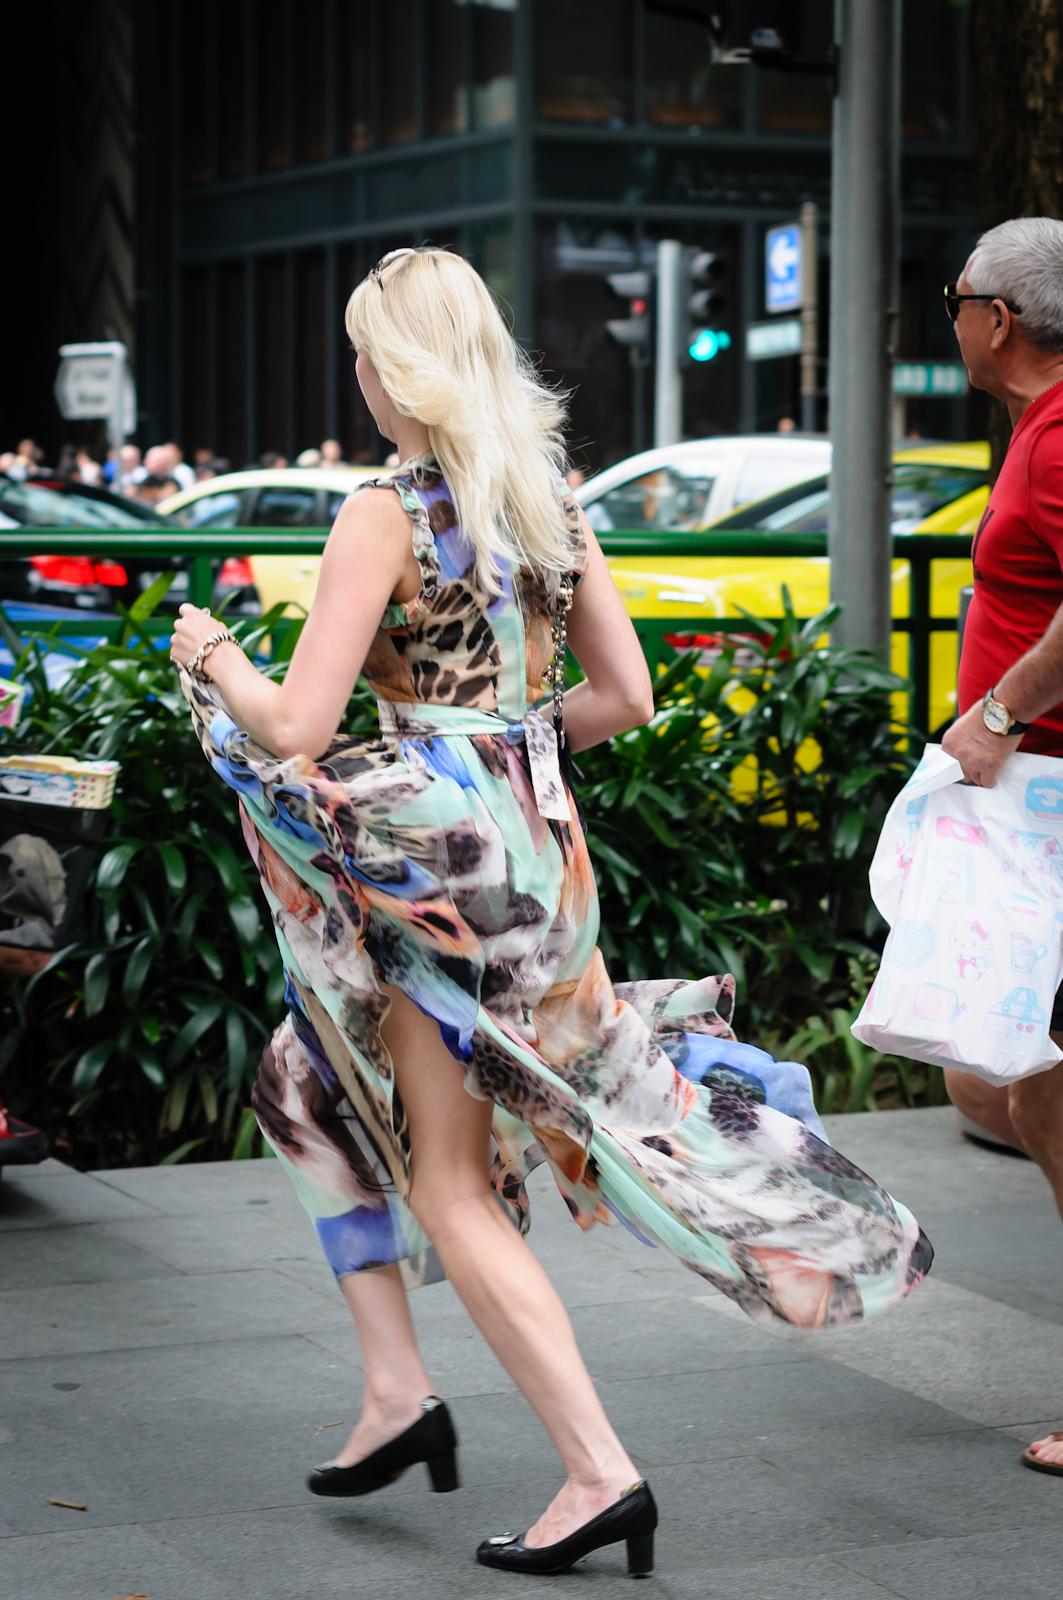 Street photography - Blonde woman in long dress running